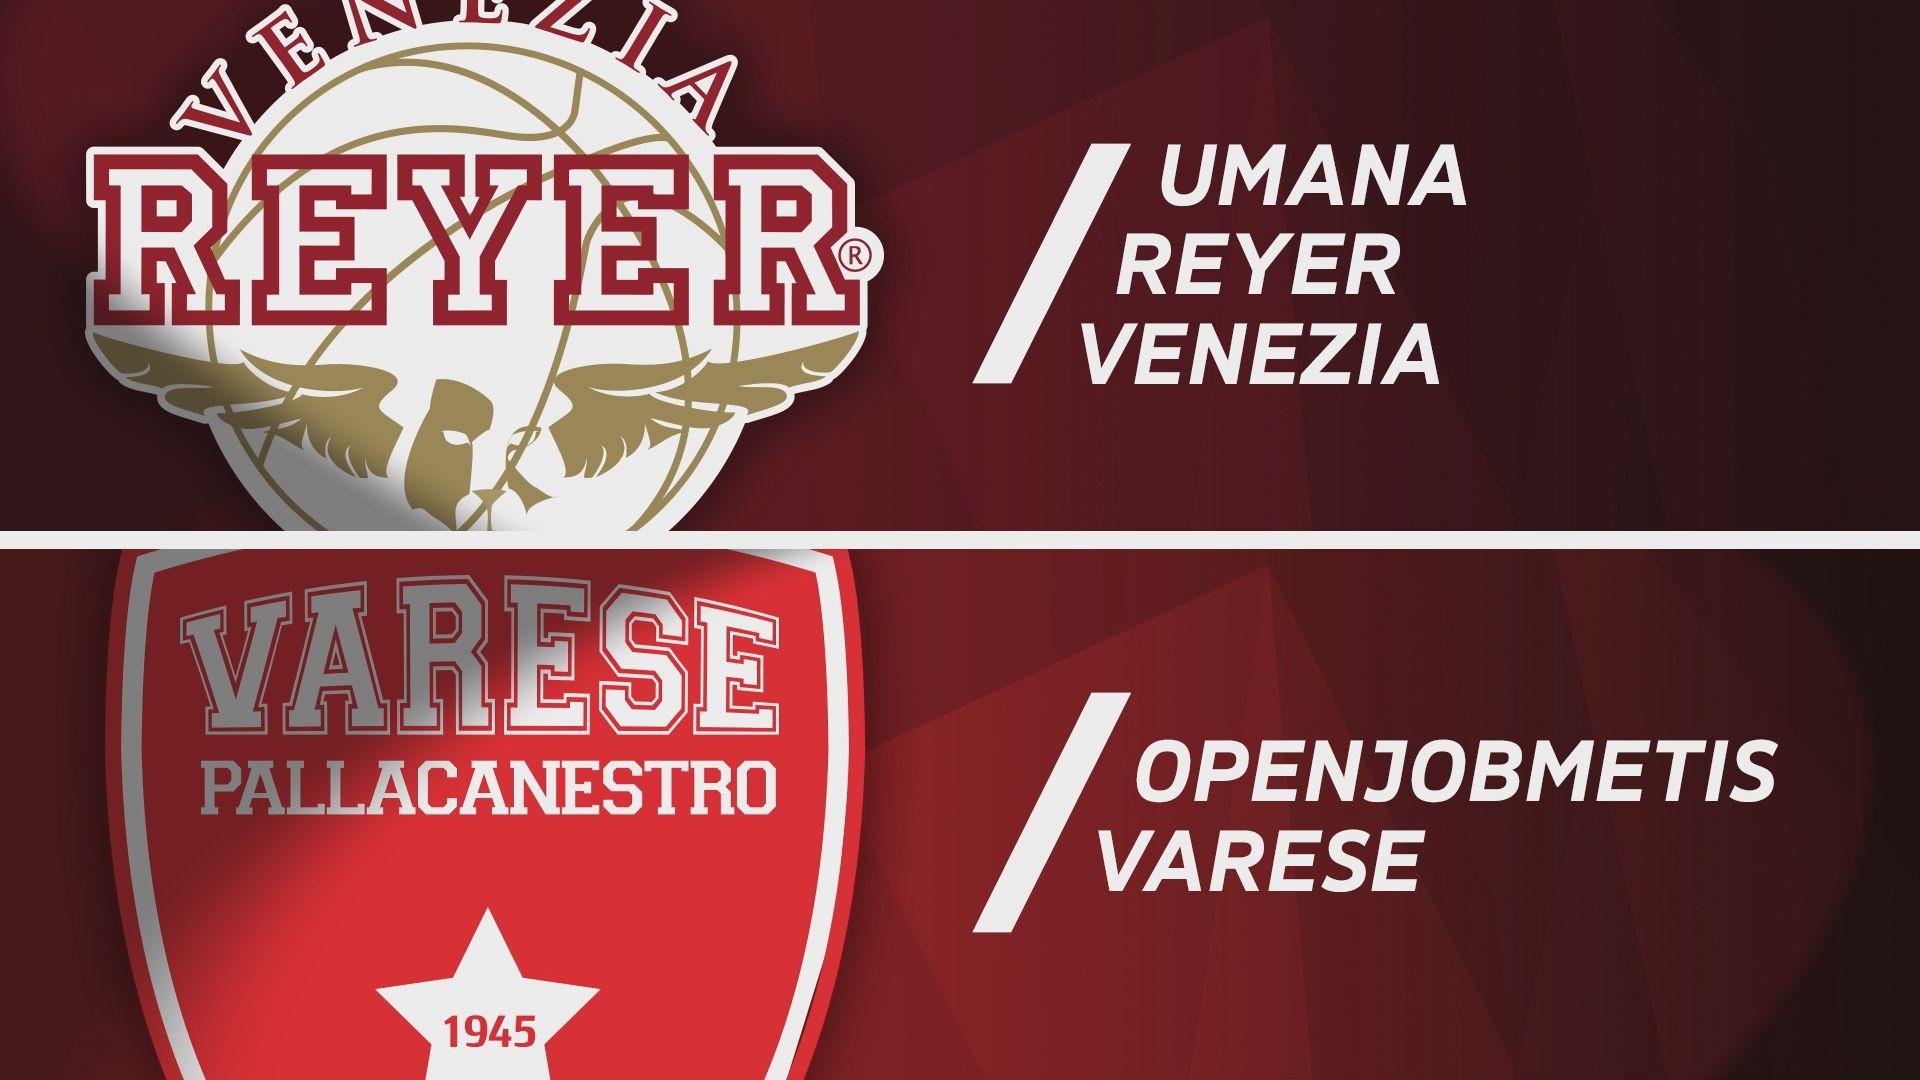 Umana Reyer Venezia - Openjobmetis Varese 86-77